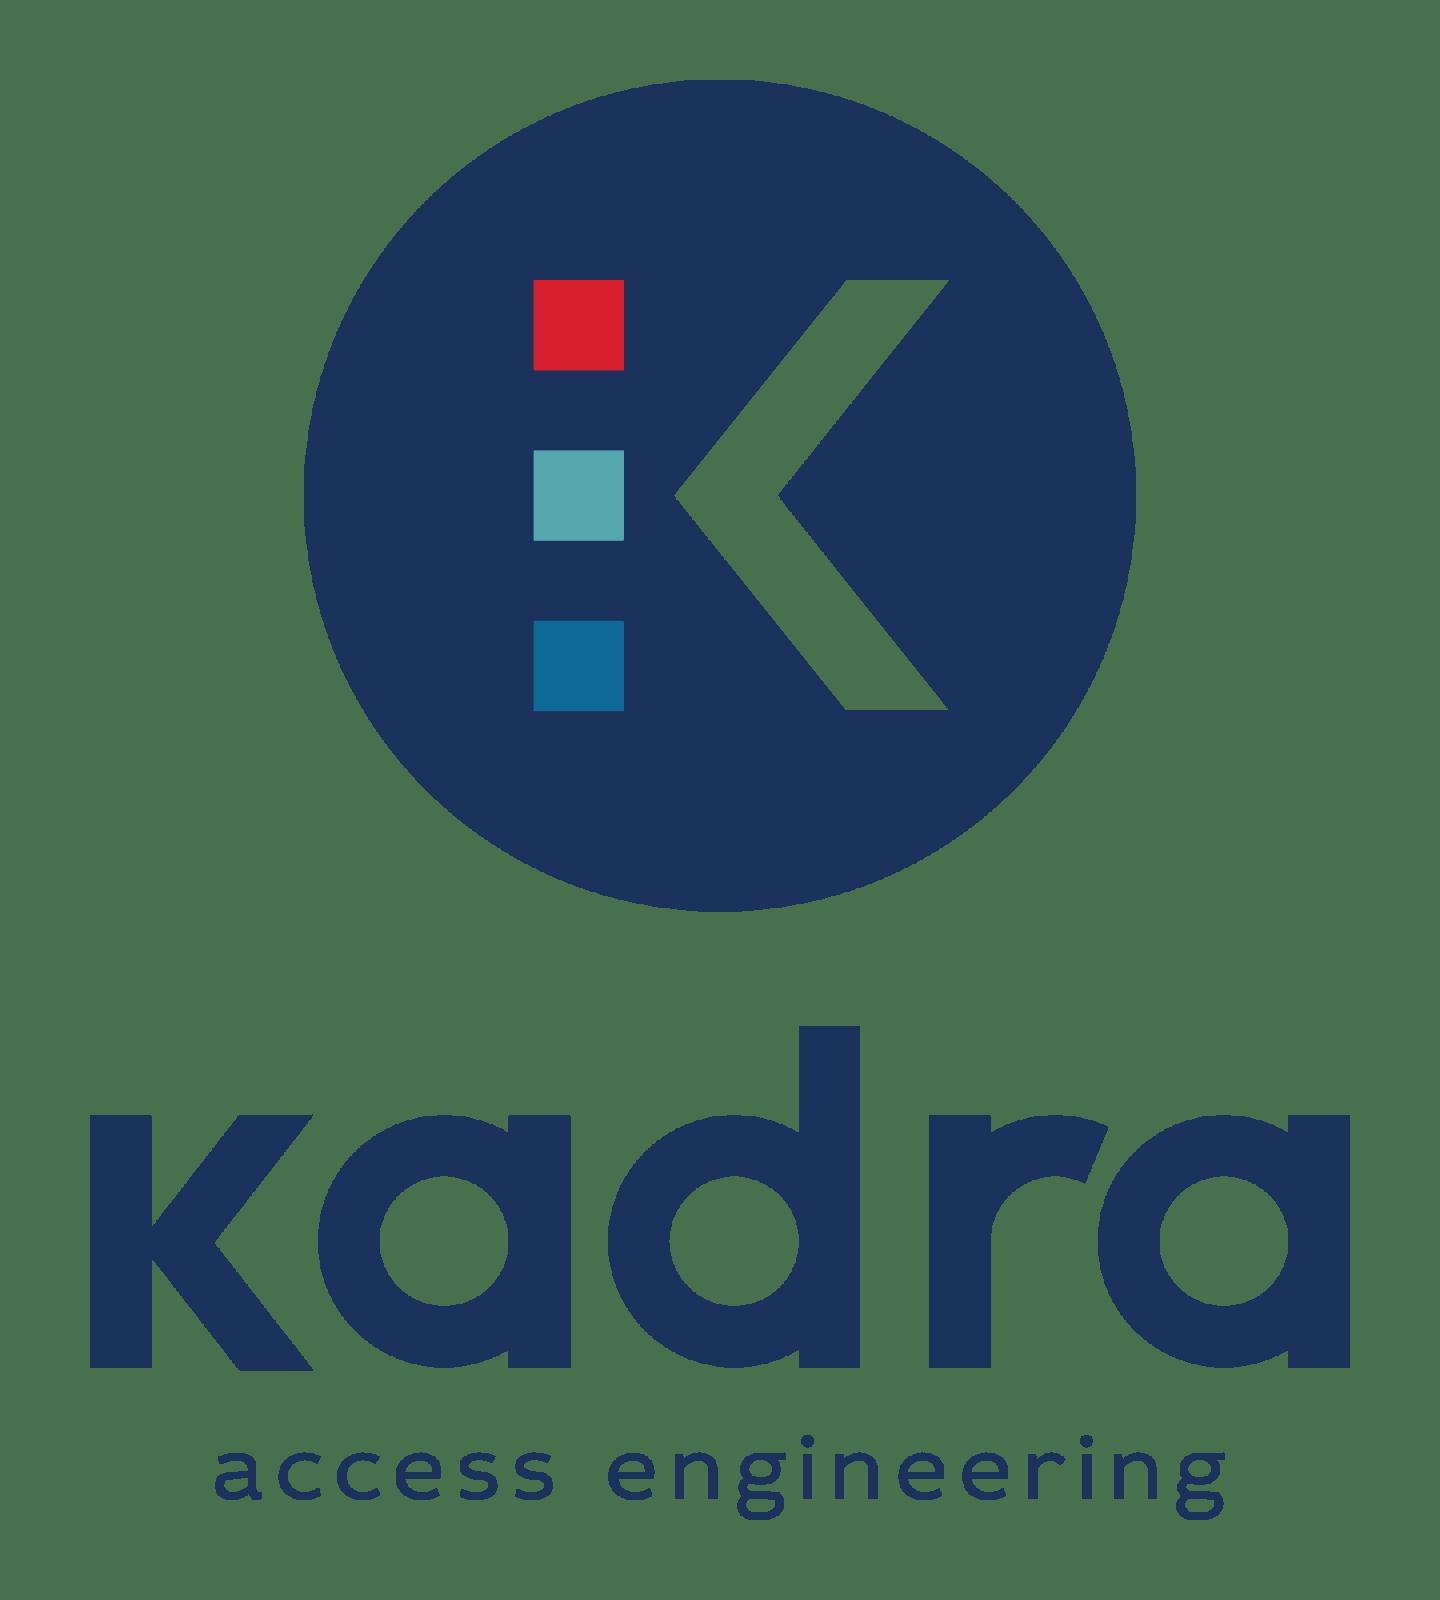 KADRA logo